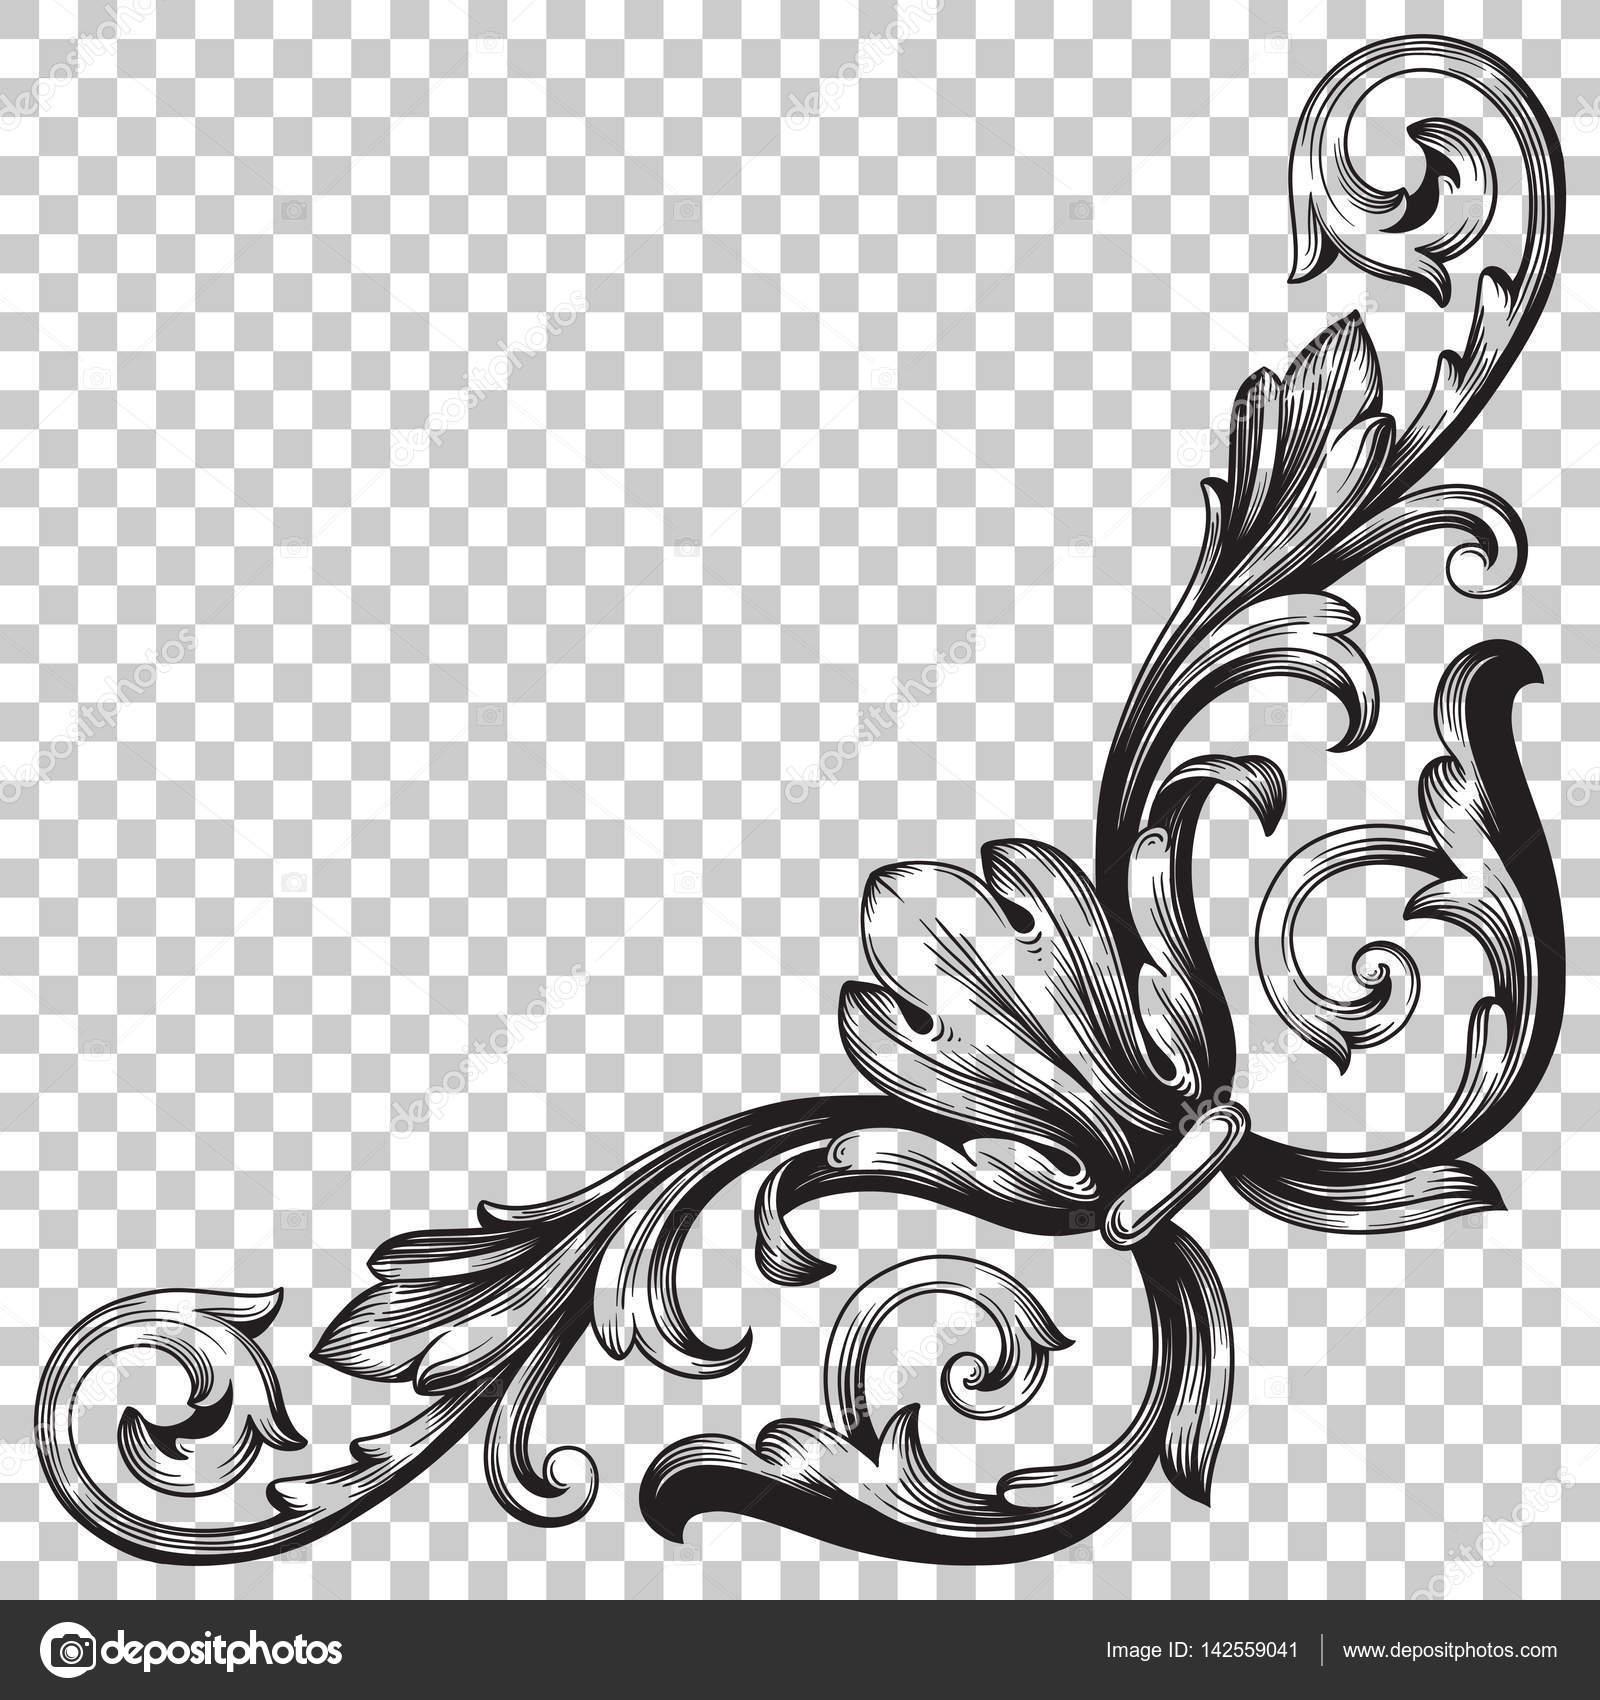 Corner baroque ornament decoration element stock vector isolate vintage corner baroque ornament retro pattern antique style acanthus decorative design element filigree calligraphy vector you can use for wedding junglespirit Choice Image